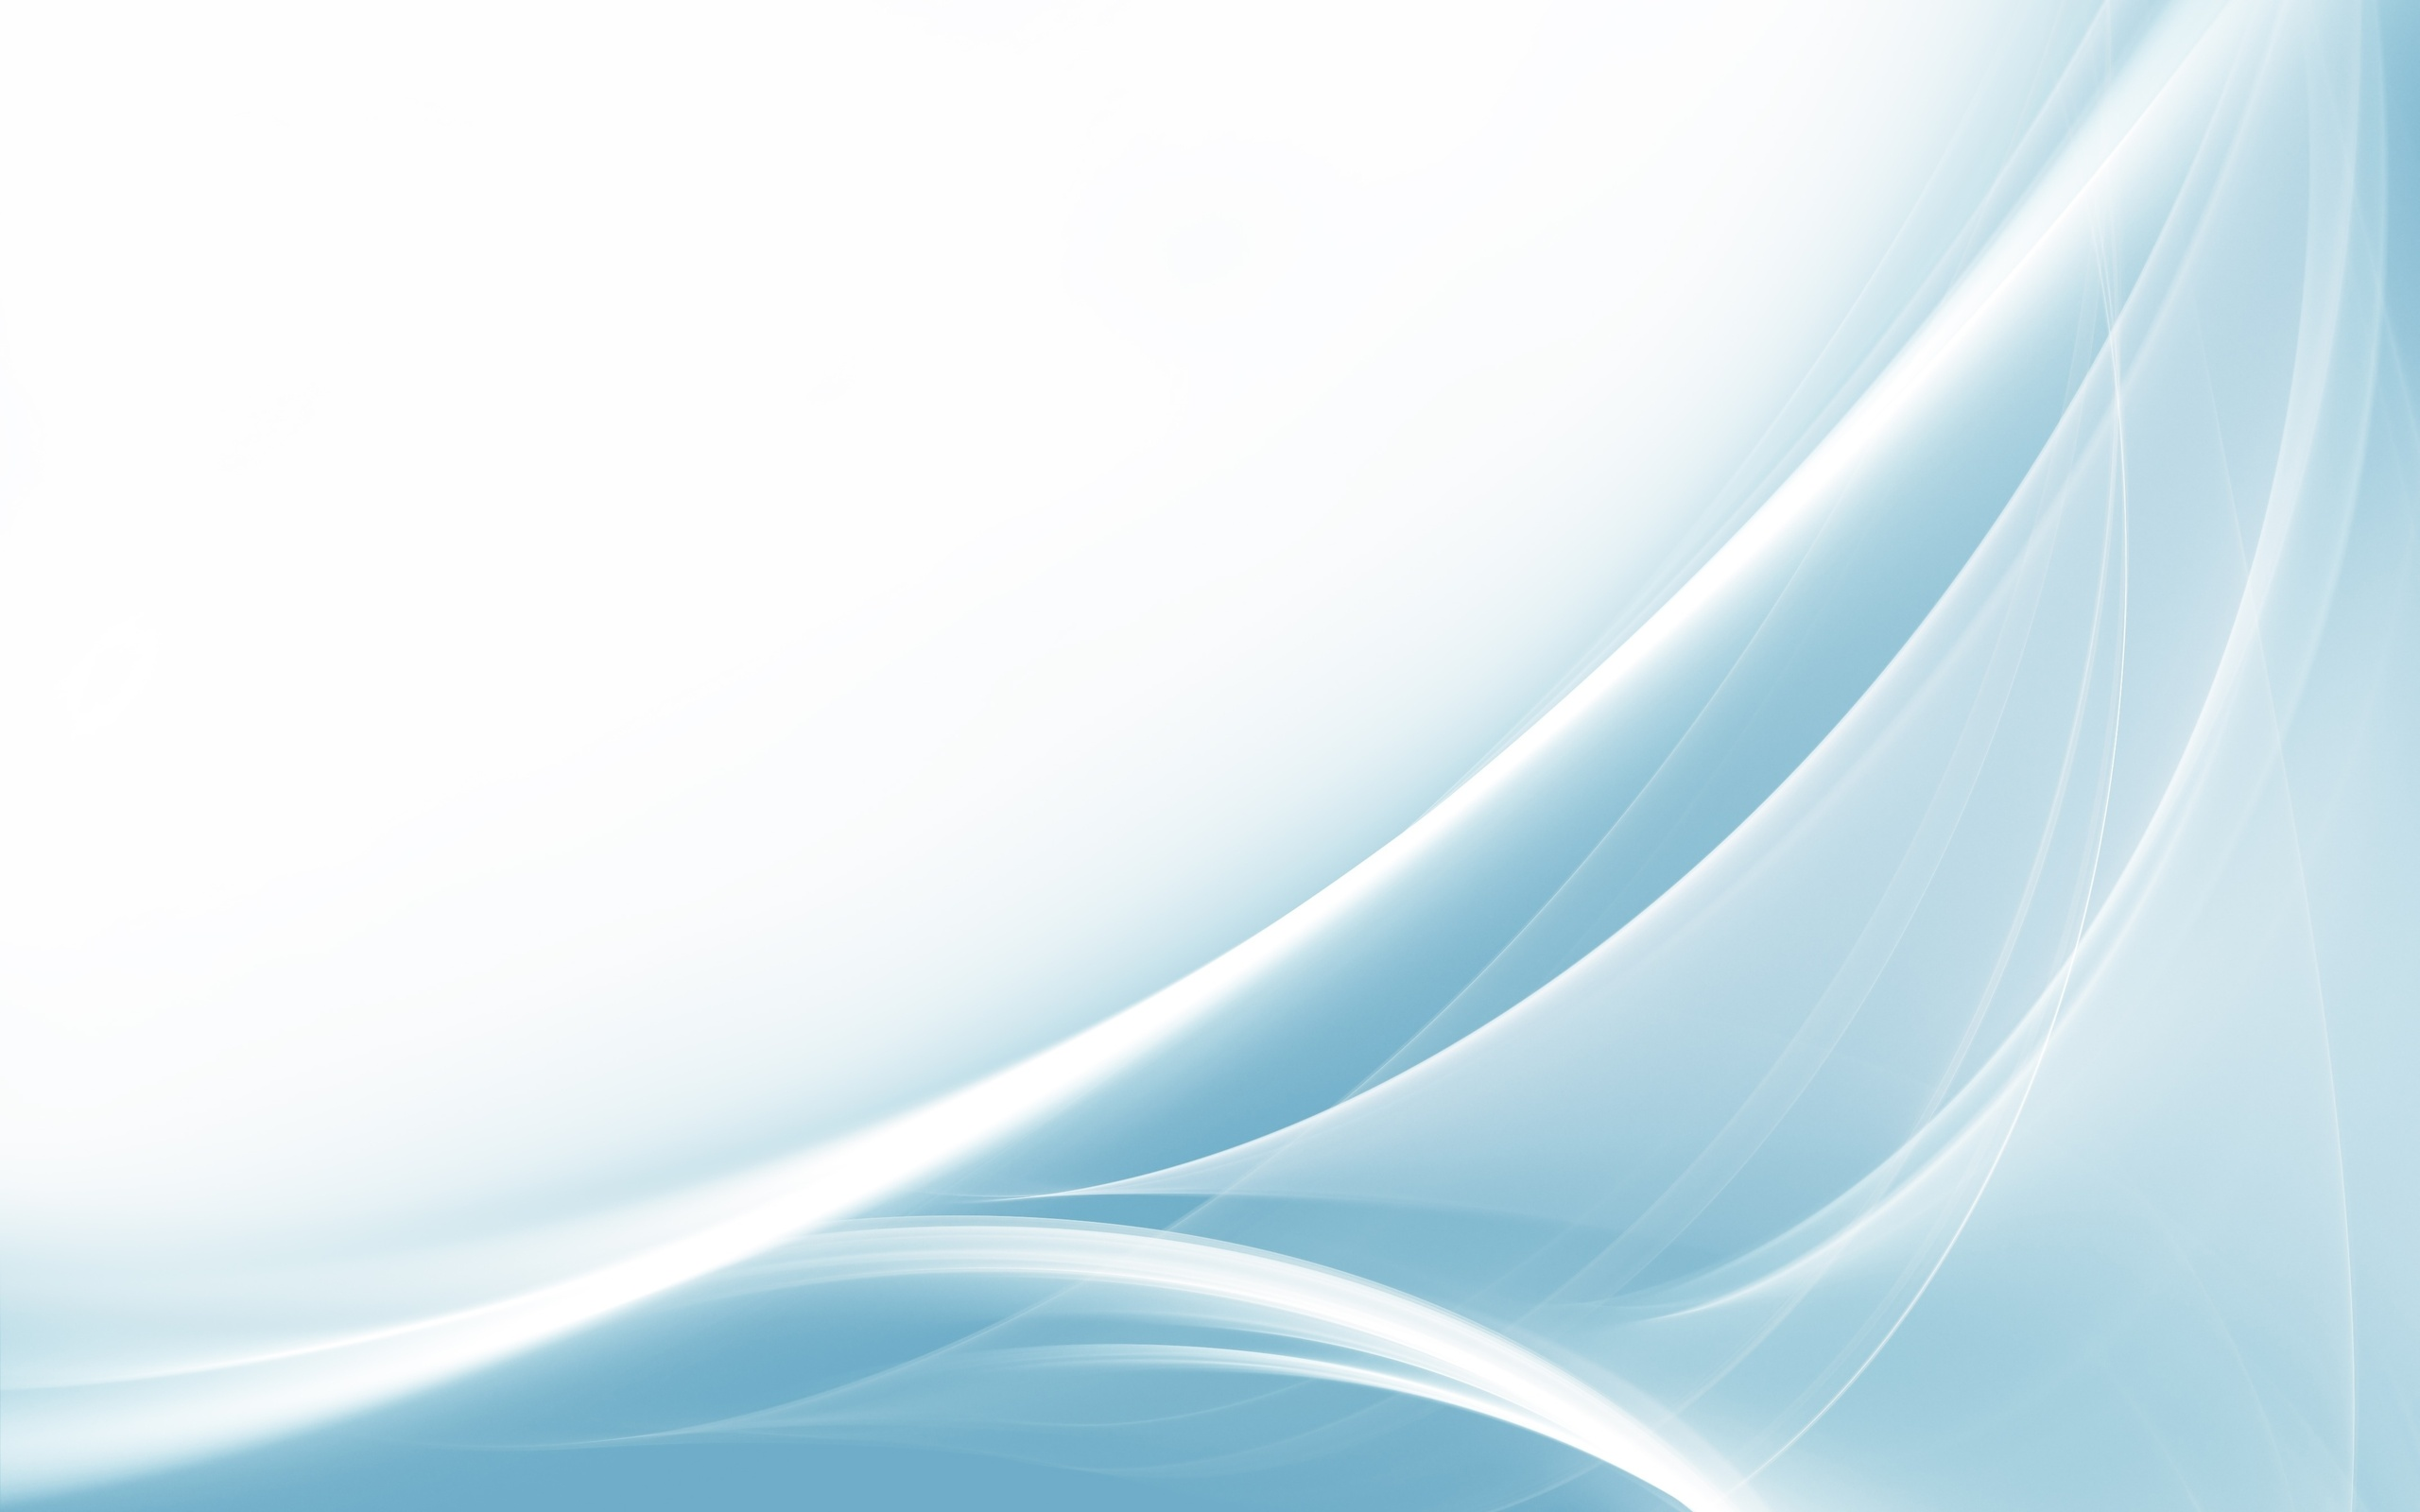 digital art hd wallpaper background image 2560x1600 id 260640